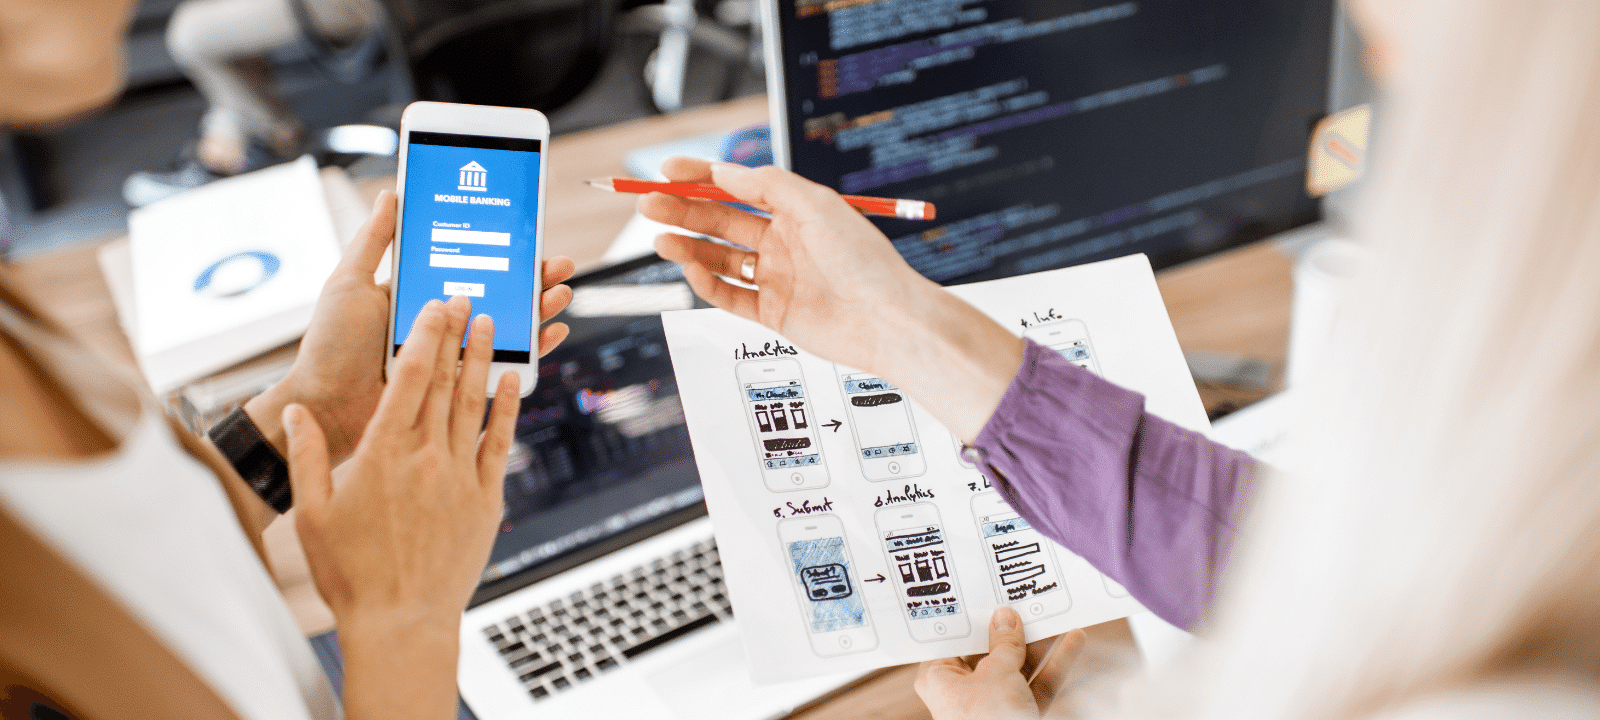 HCL Domino Volt - developpement d'applications